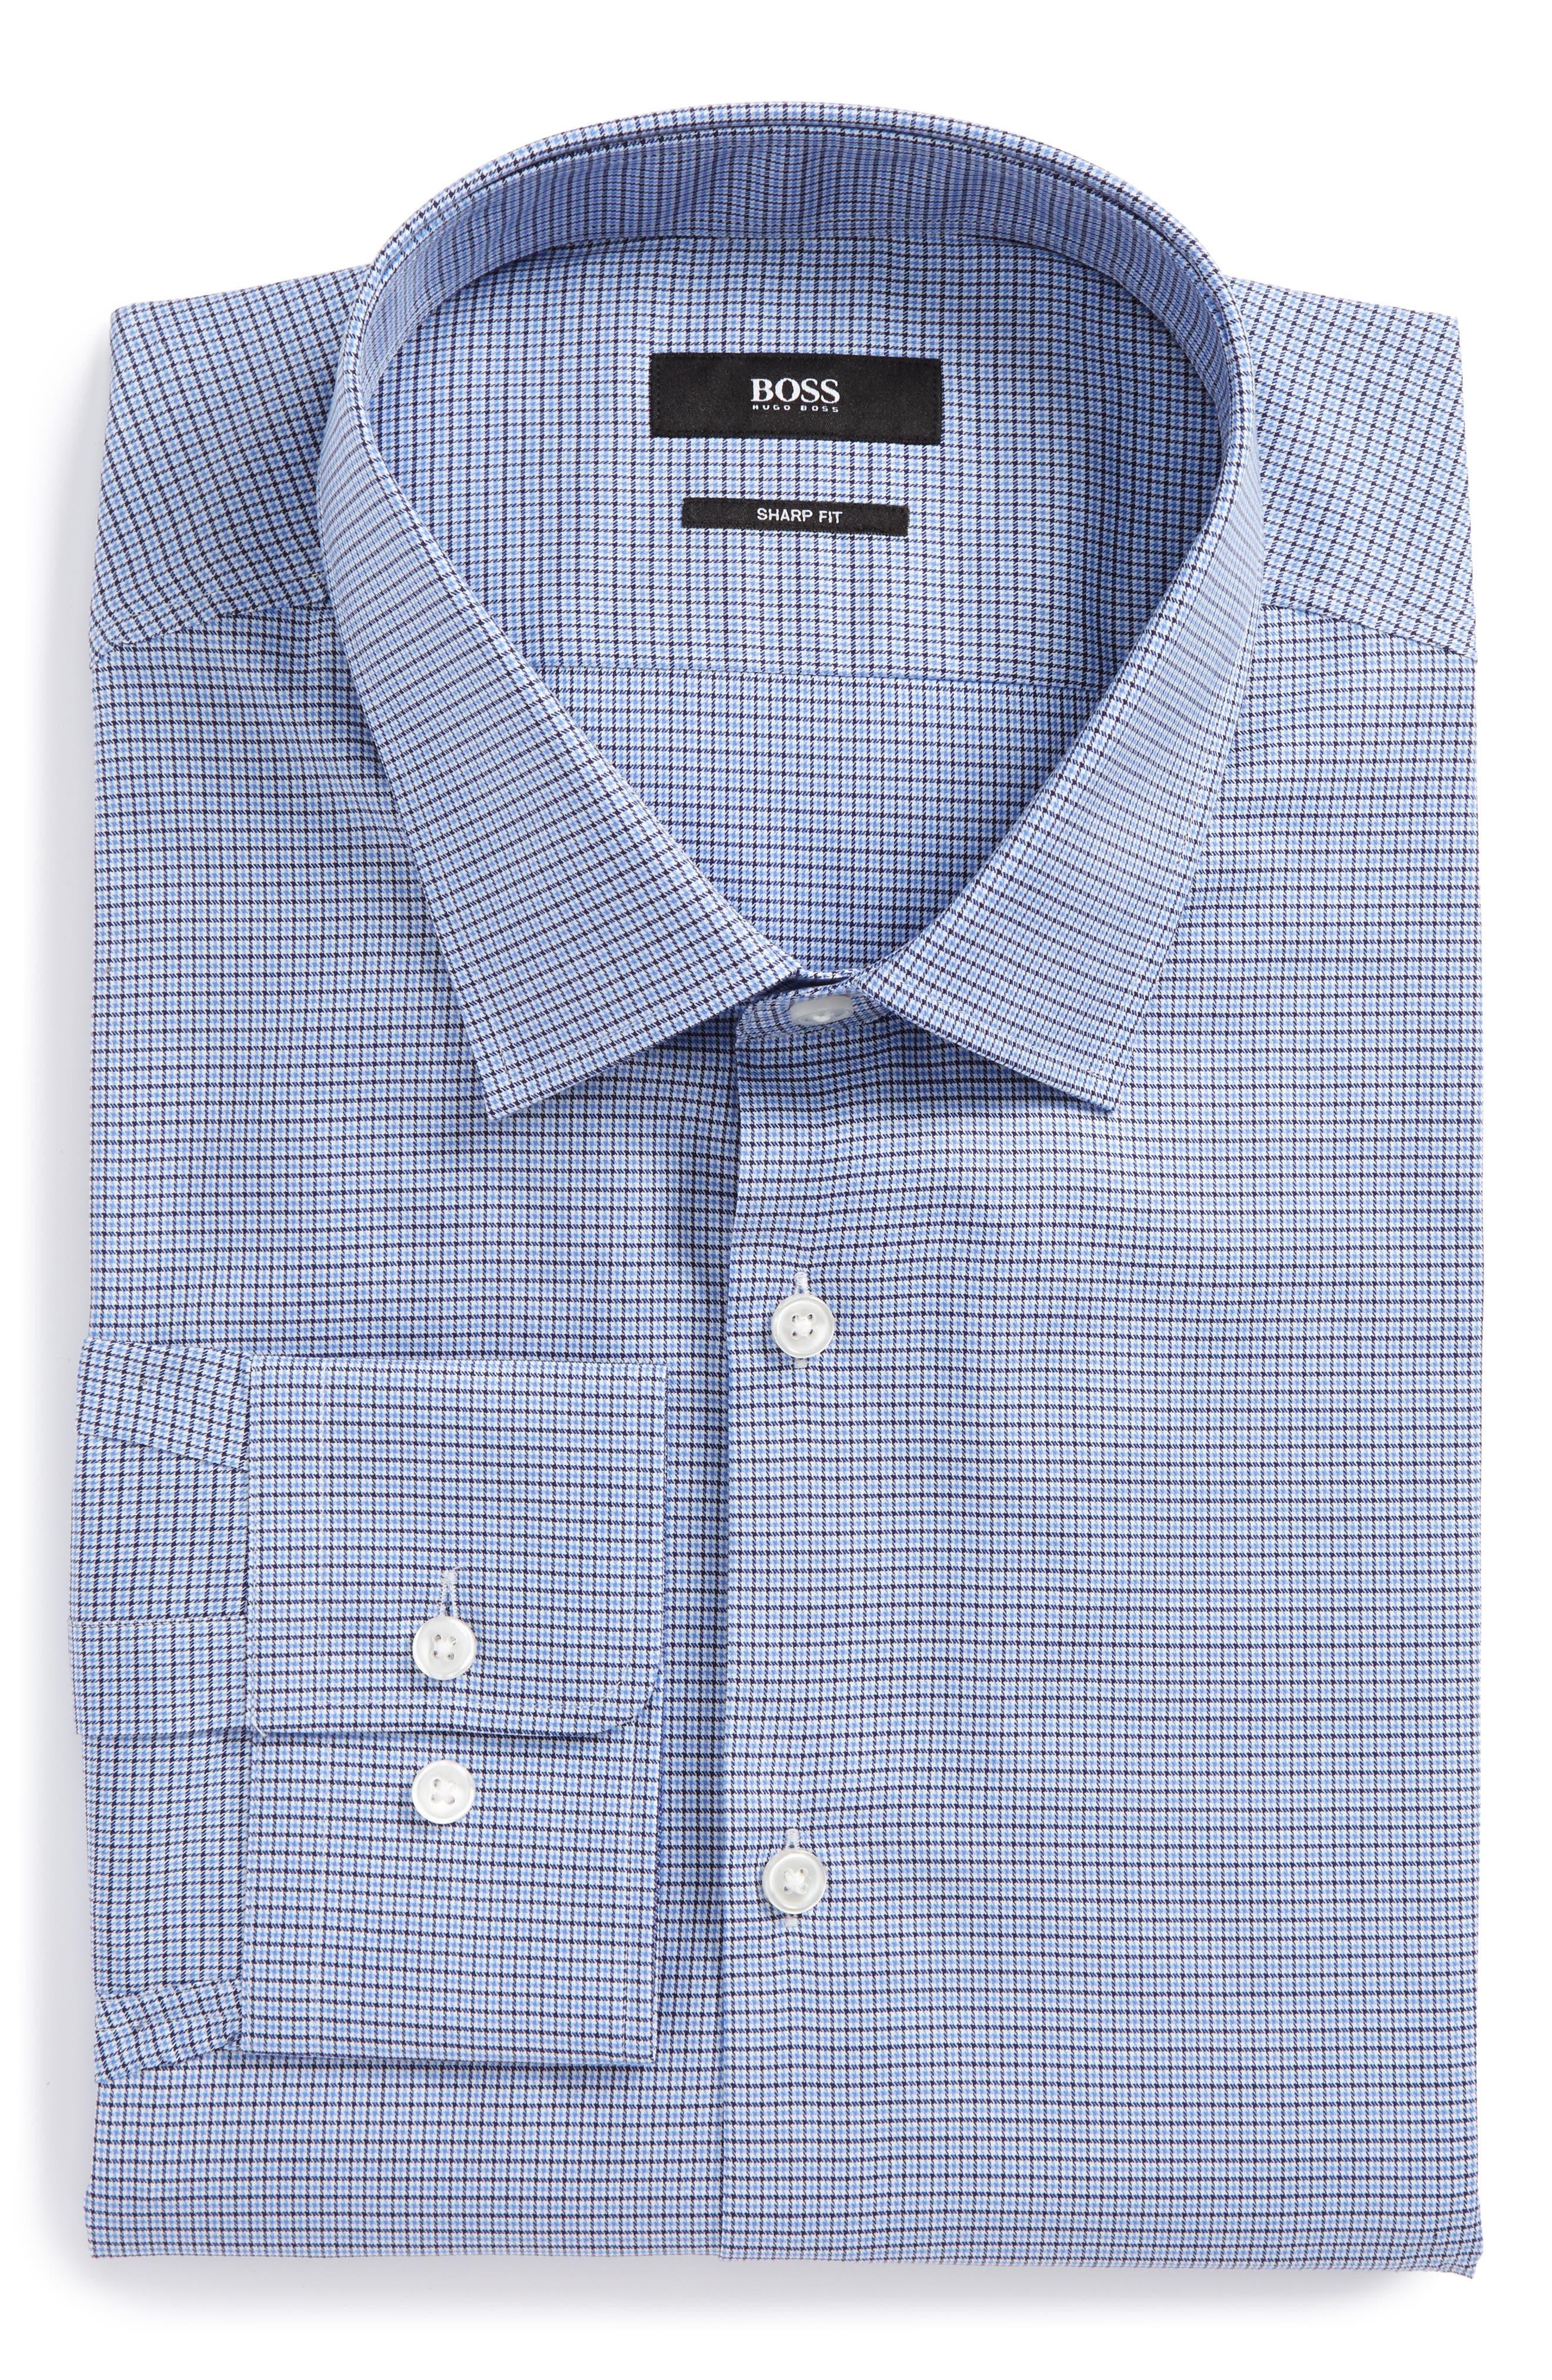 Marley Sharp Fit Dress Shirt,                         Main,                         color, 450